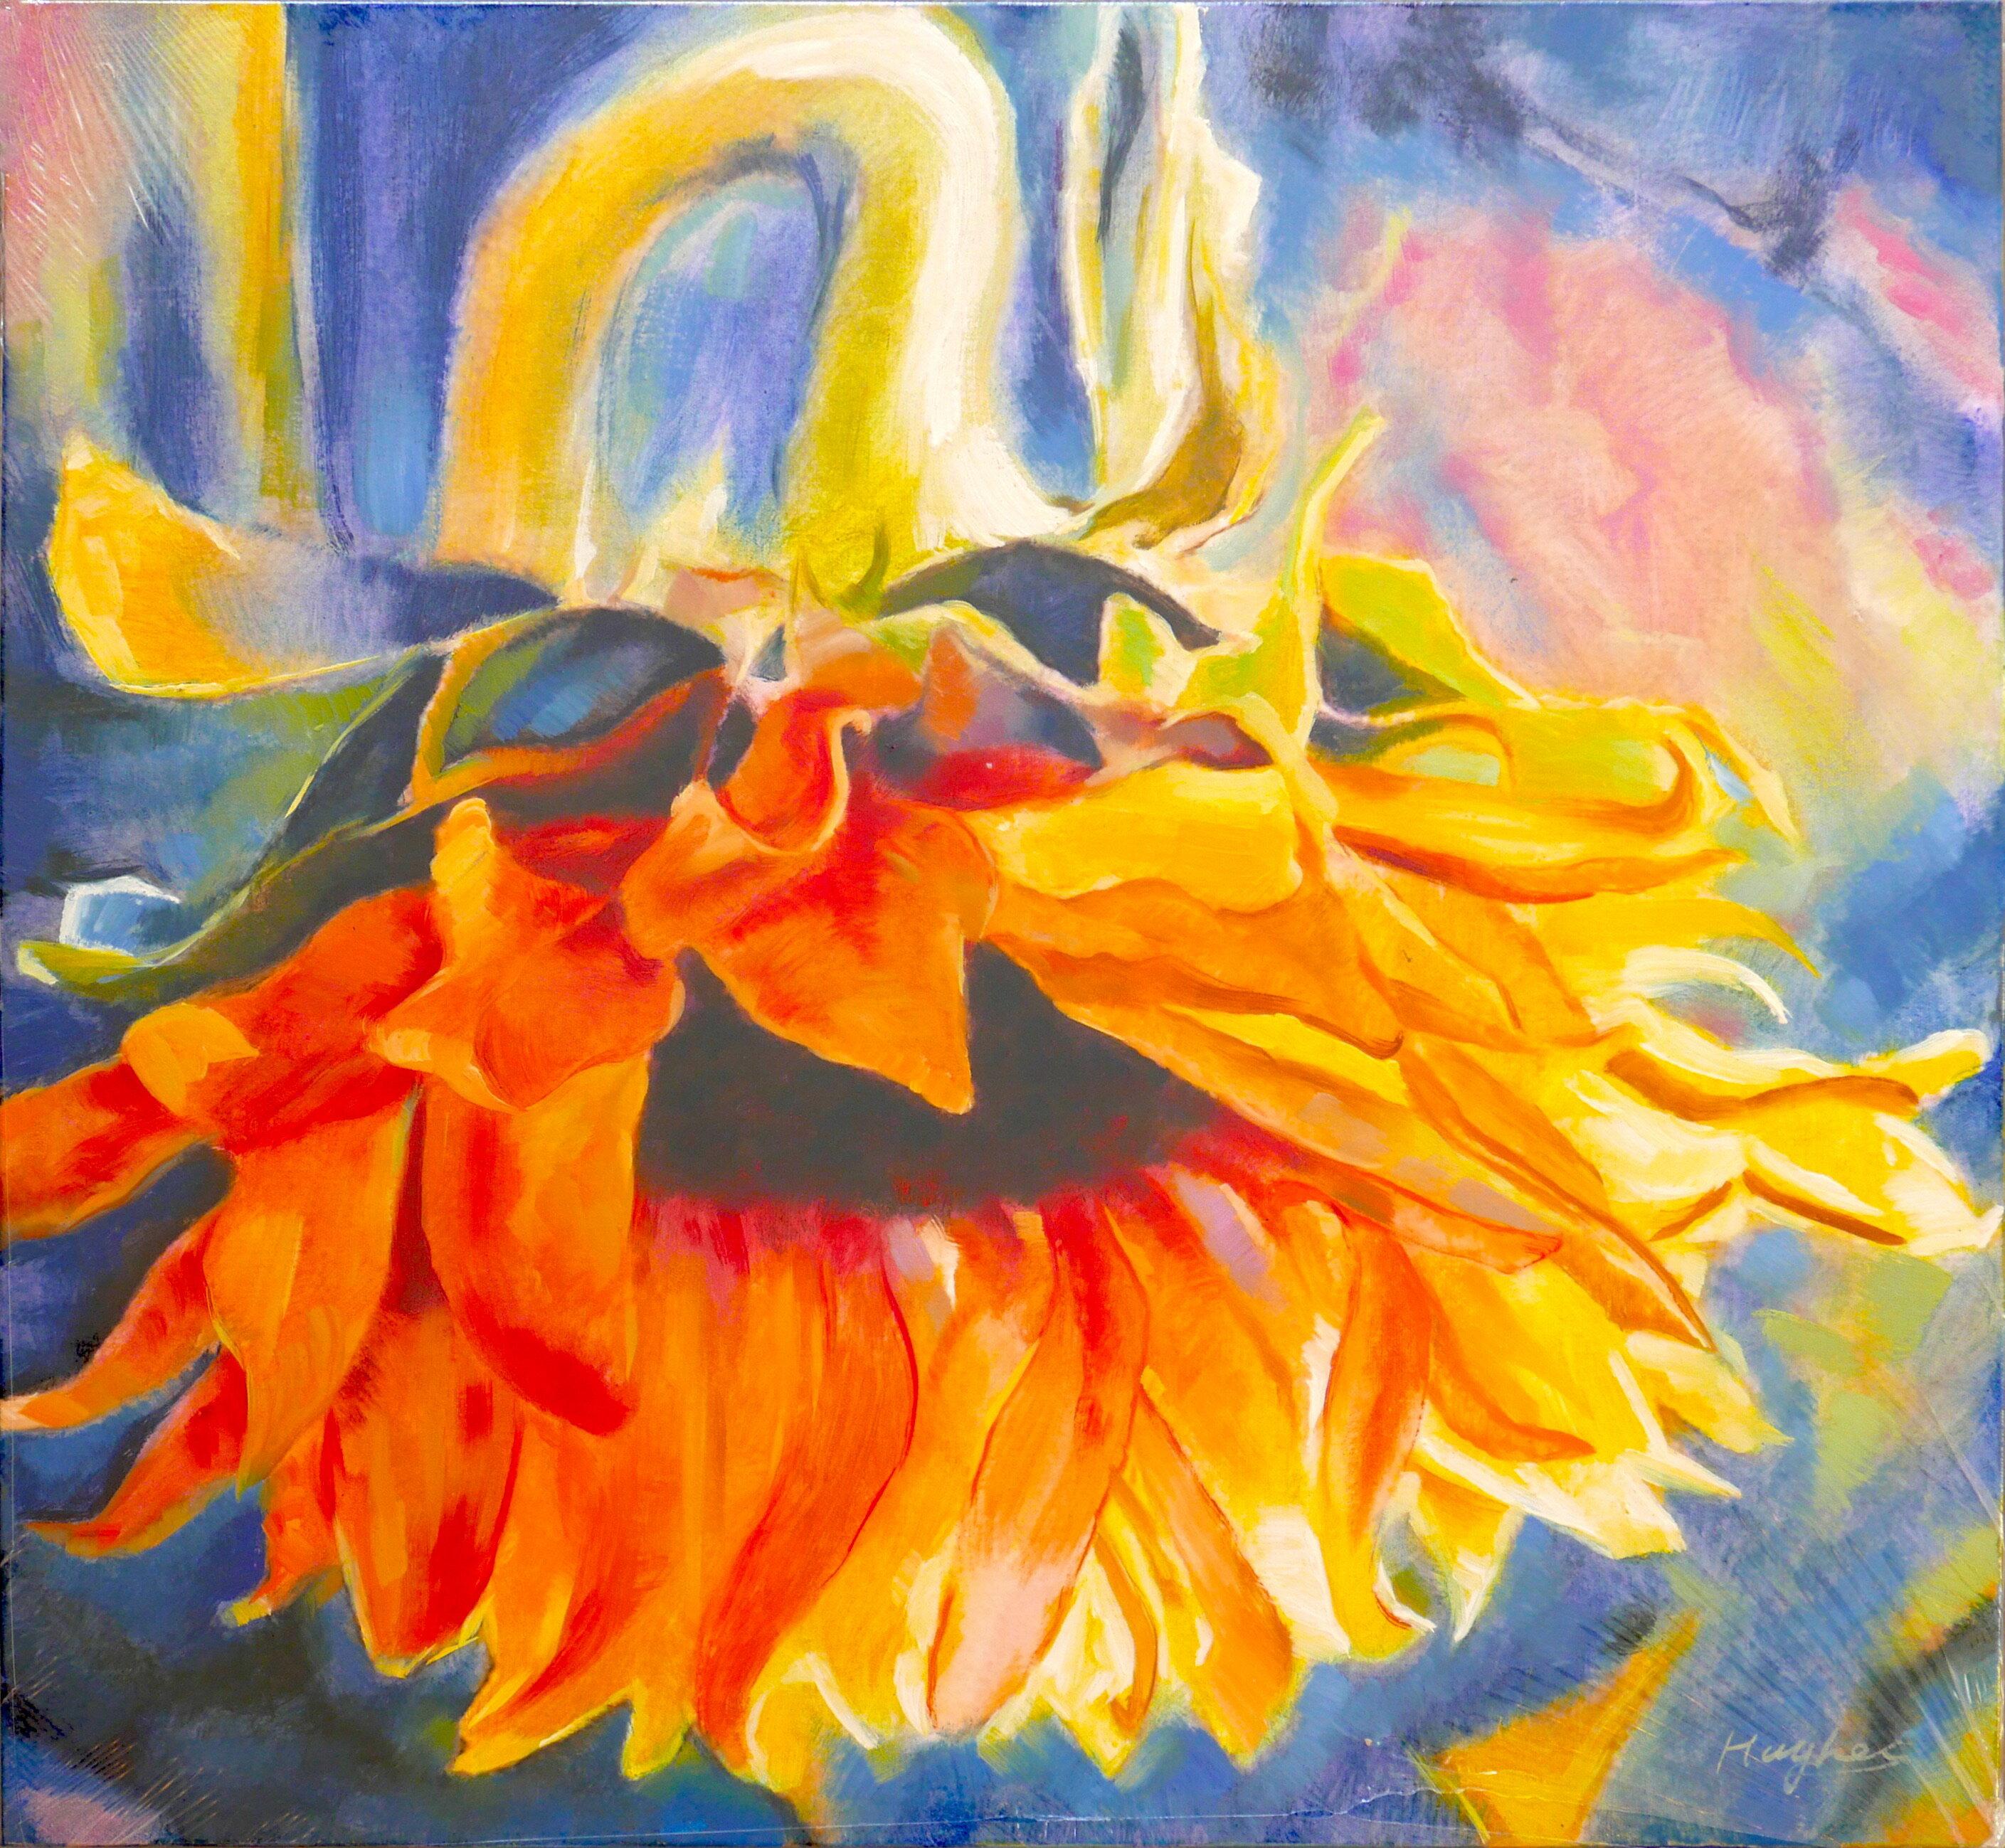 聚鯨Cetacea﹡Art【Untitled / Hughes】進口油畫 無框畫 手繪油畫